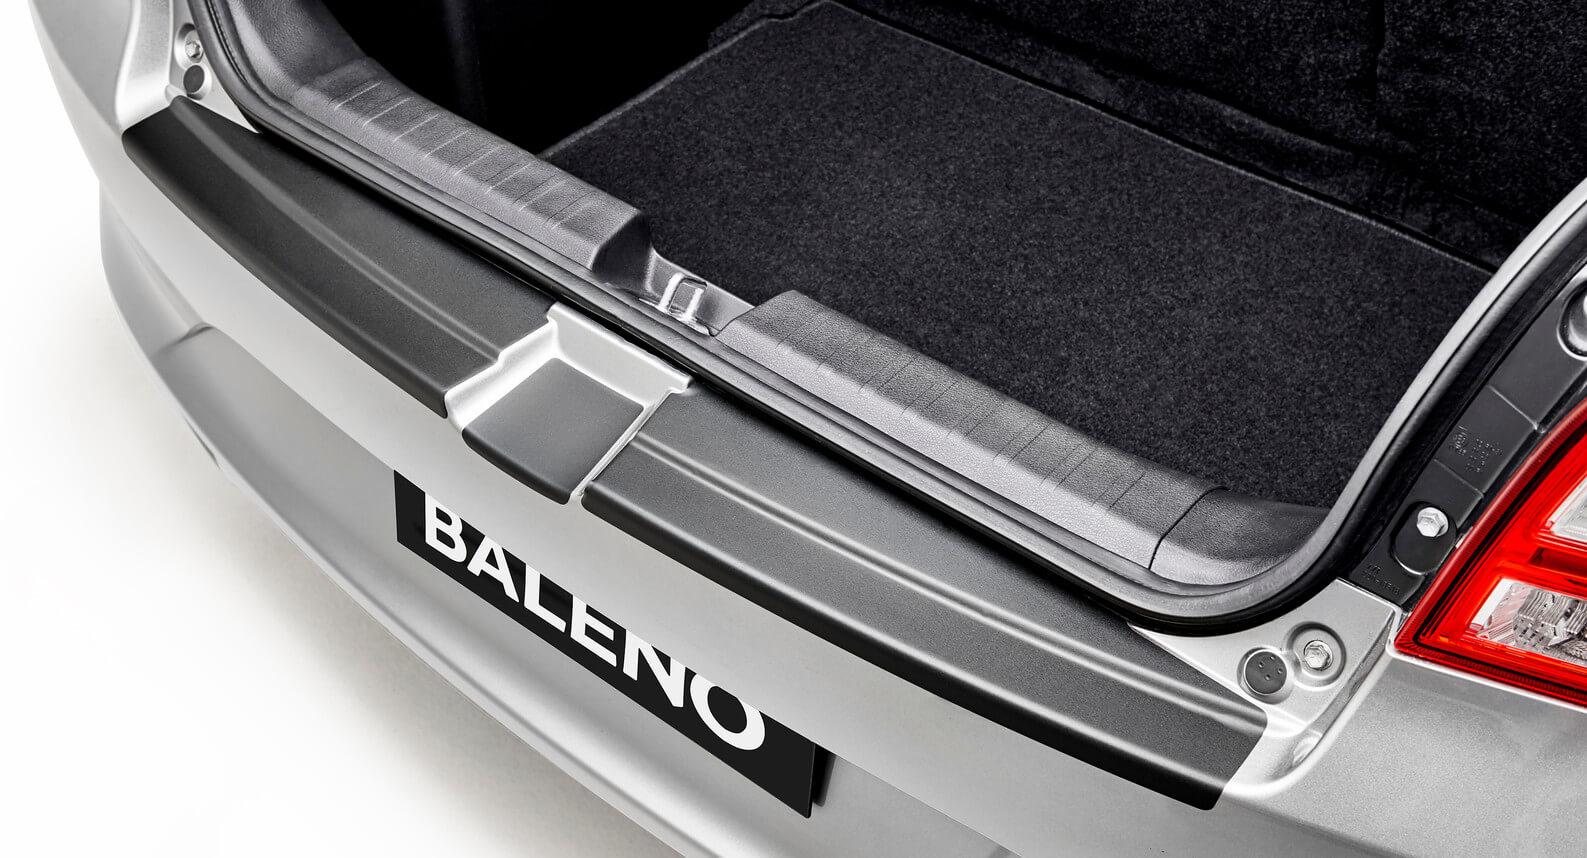 Baleno - Bumper Protection Film, Black